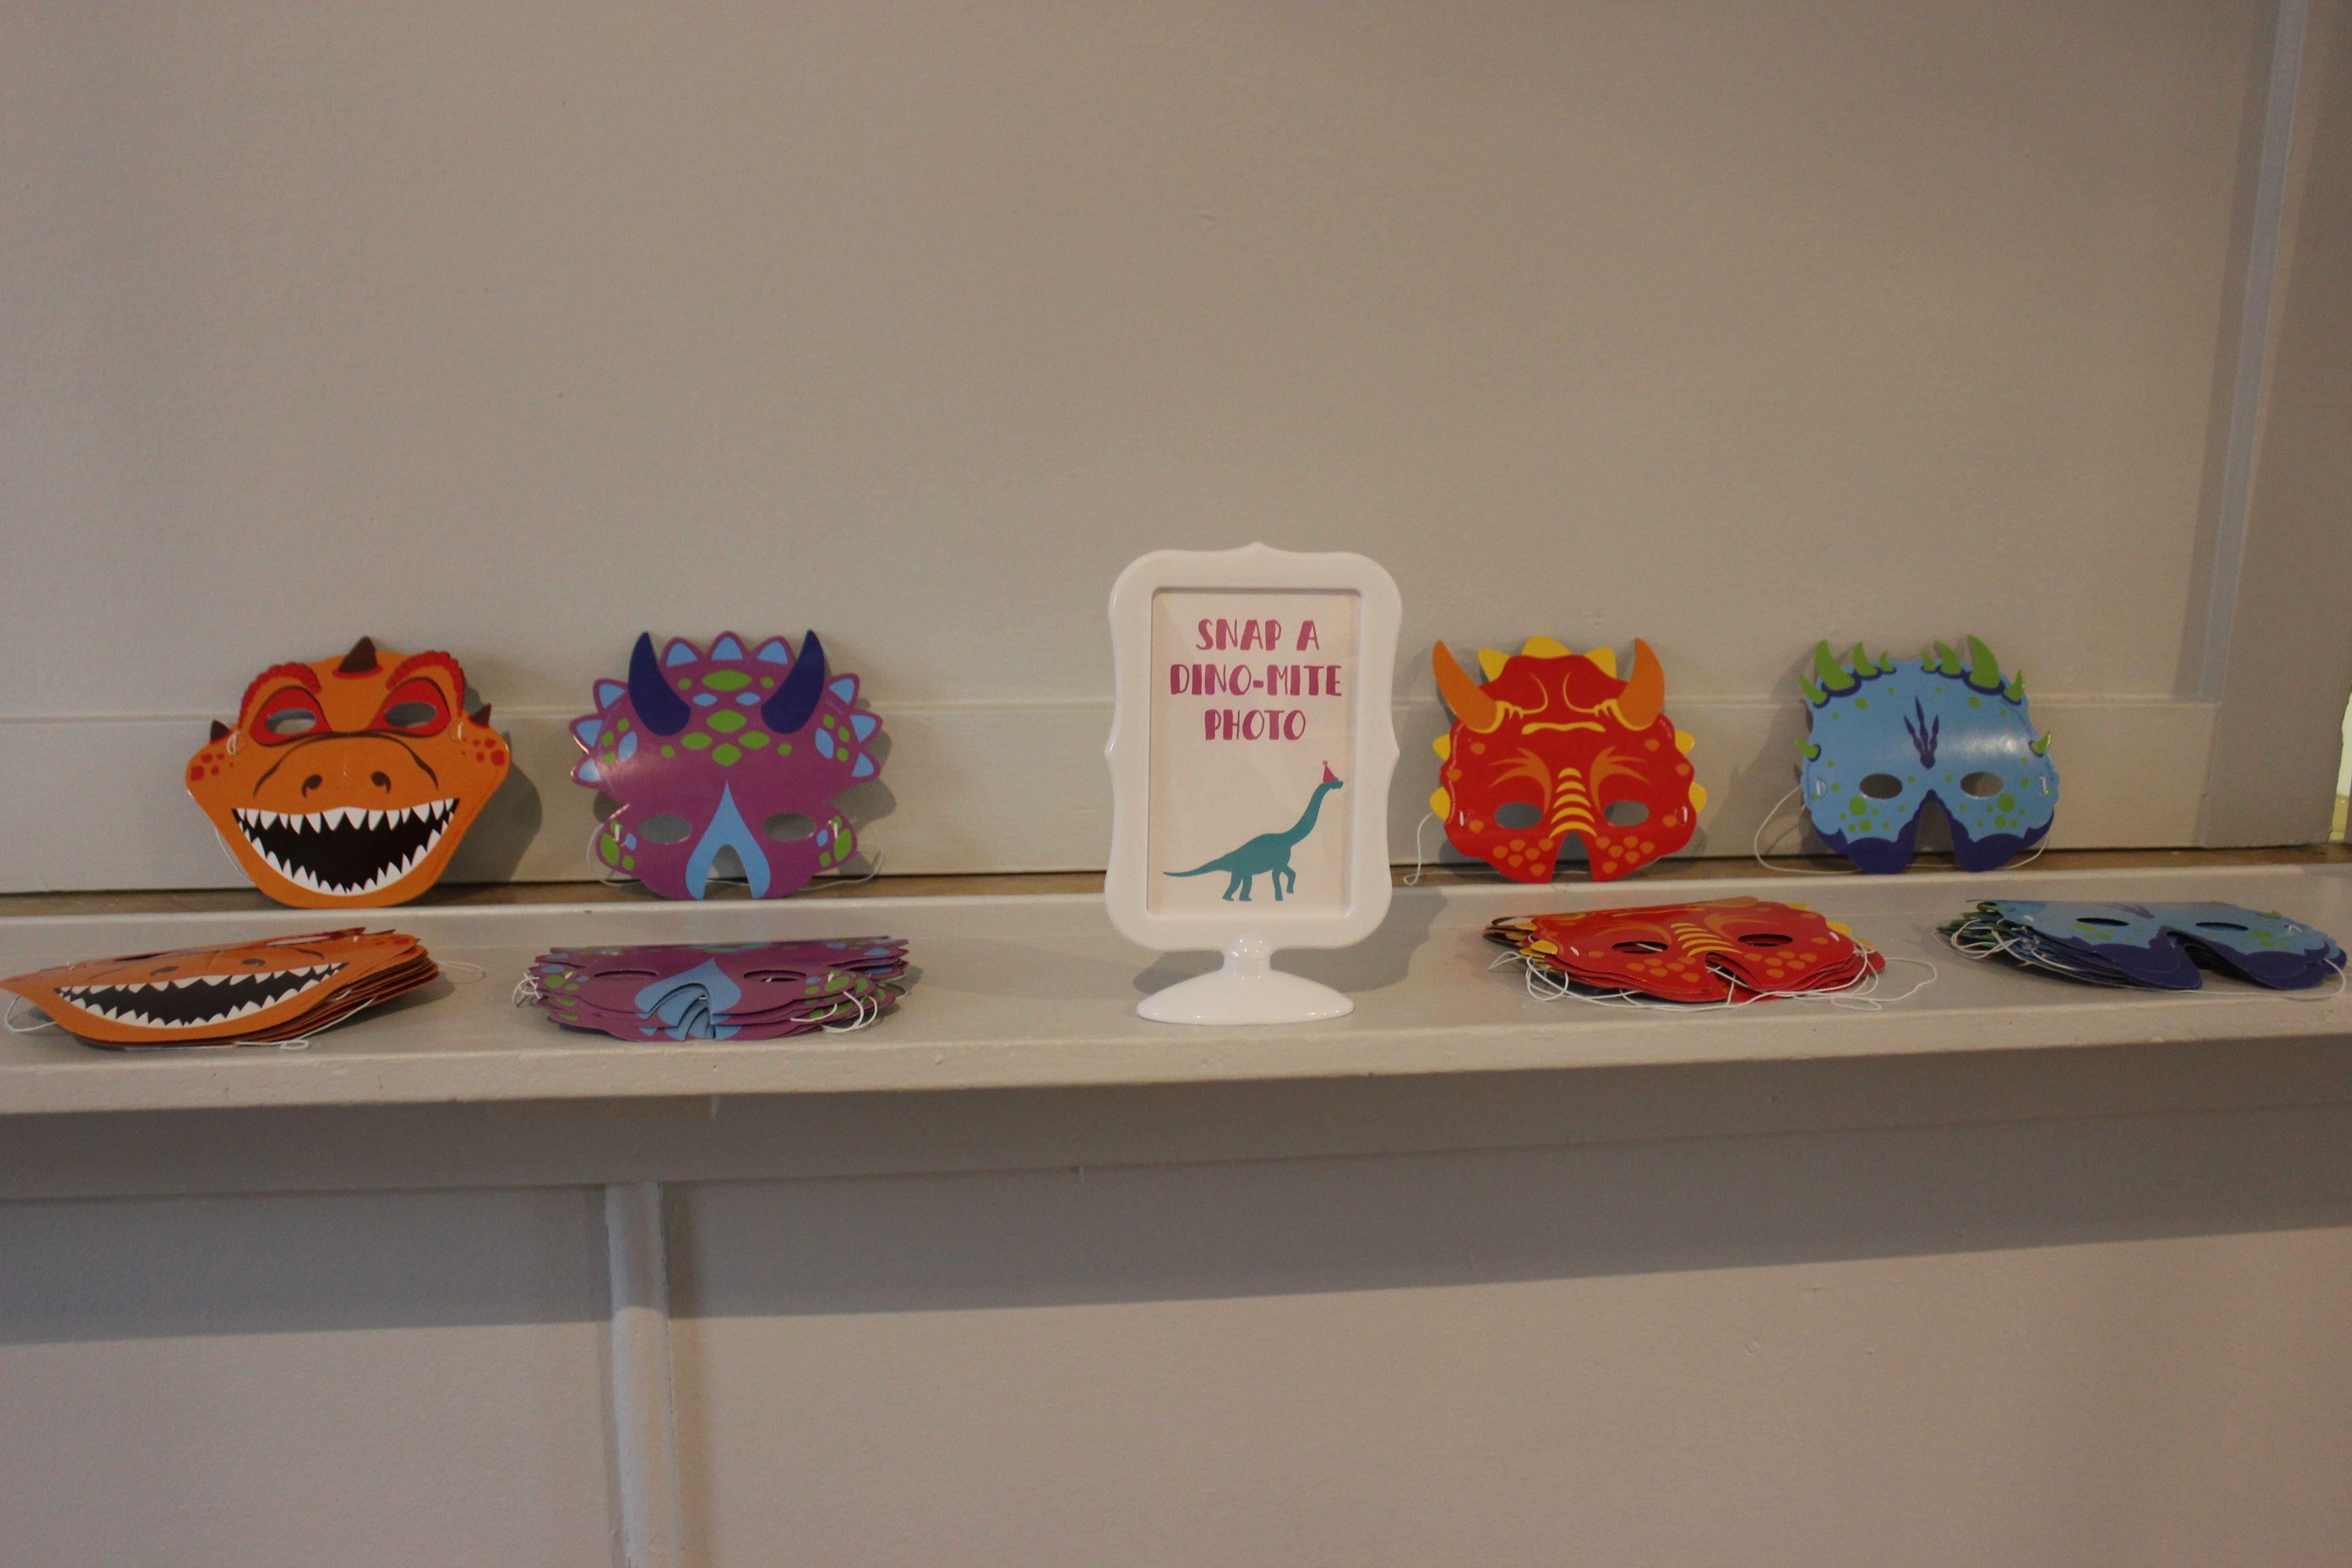 Dinosaur birthday party photo booth idea with face masks